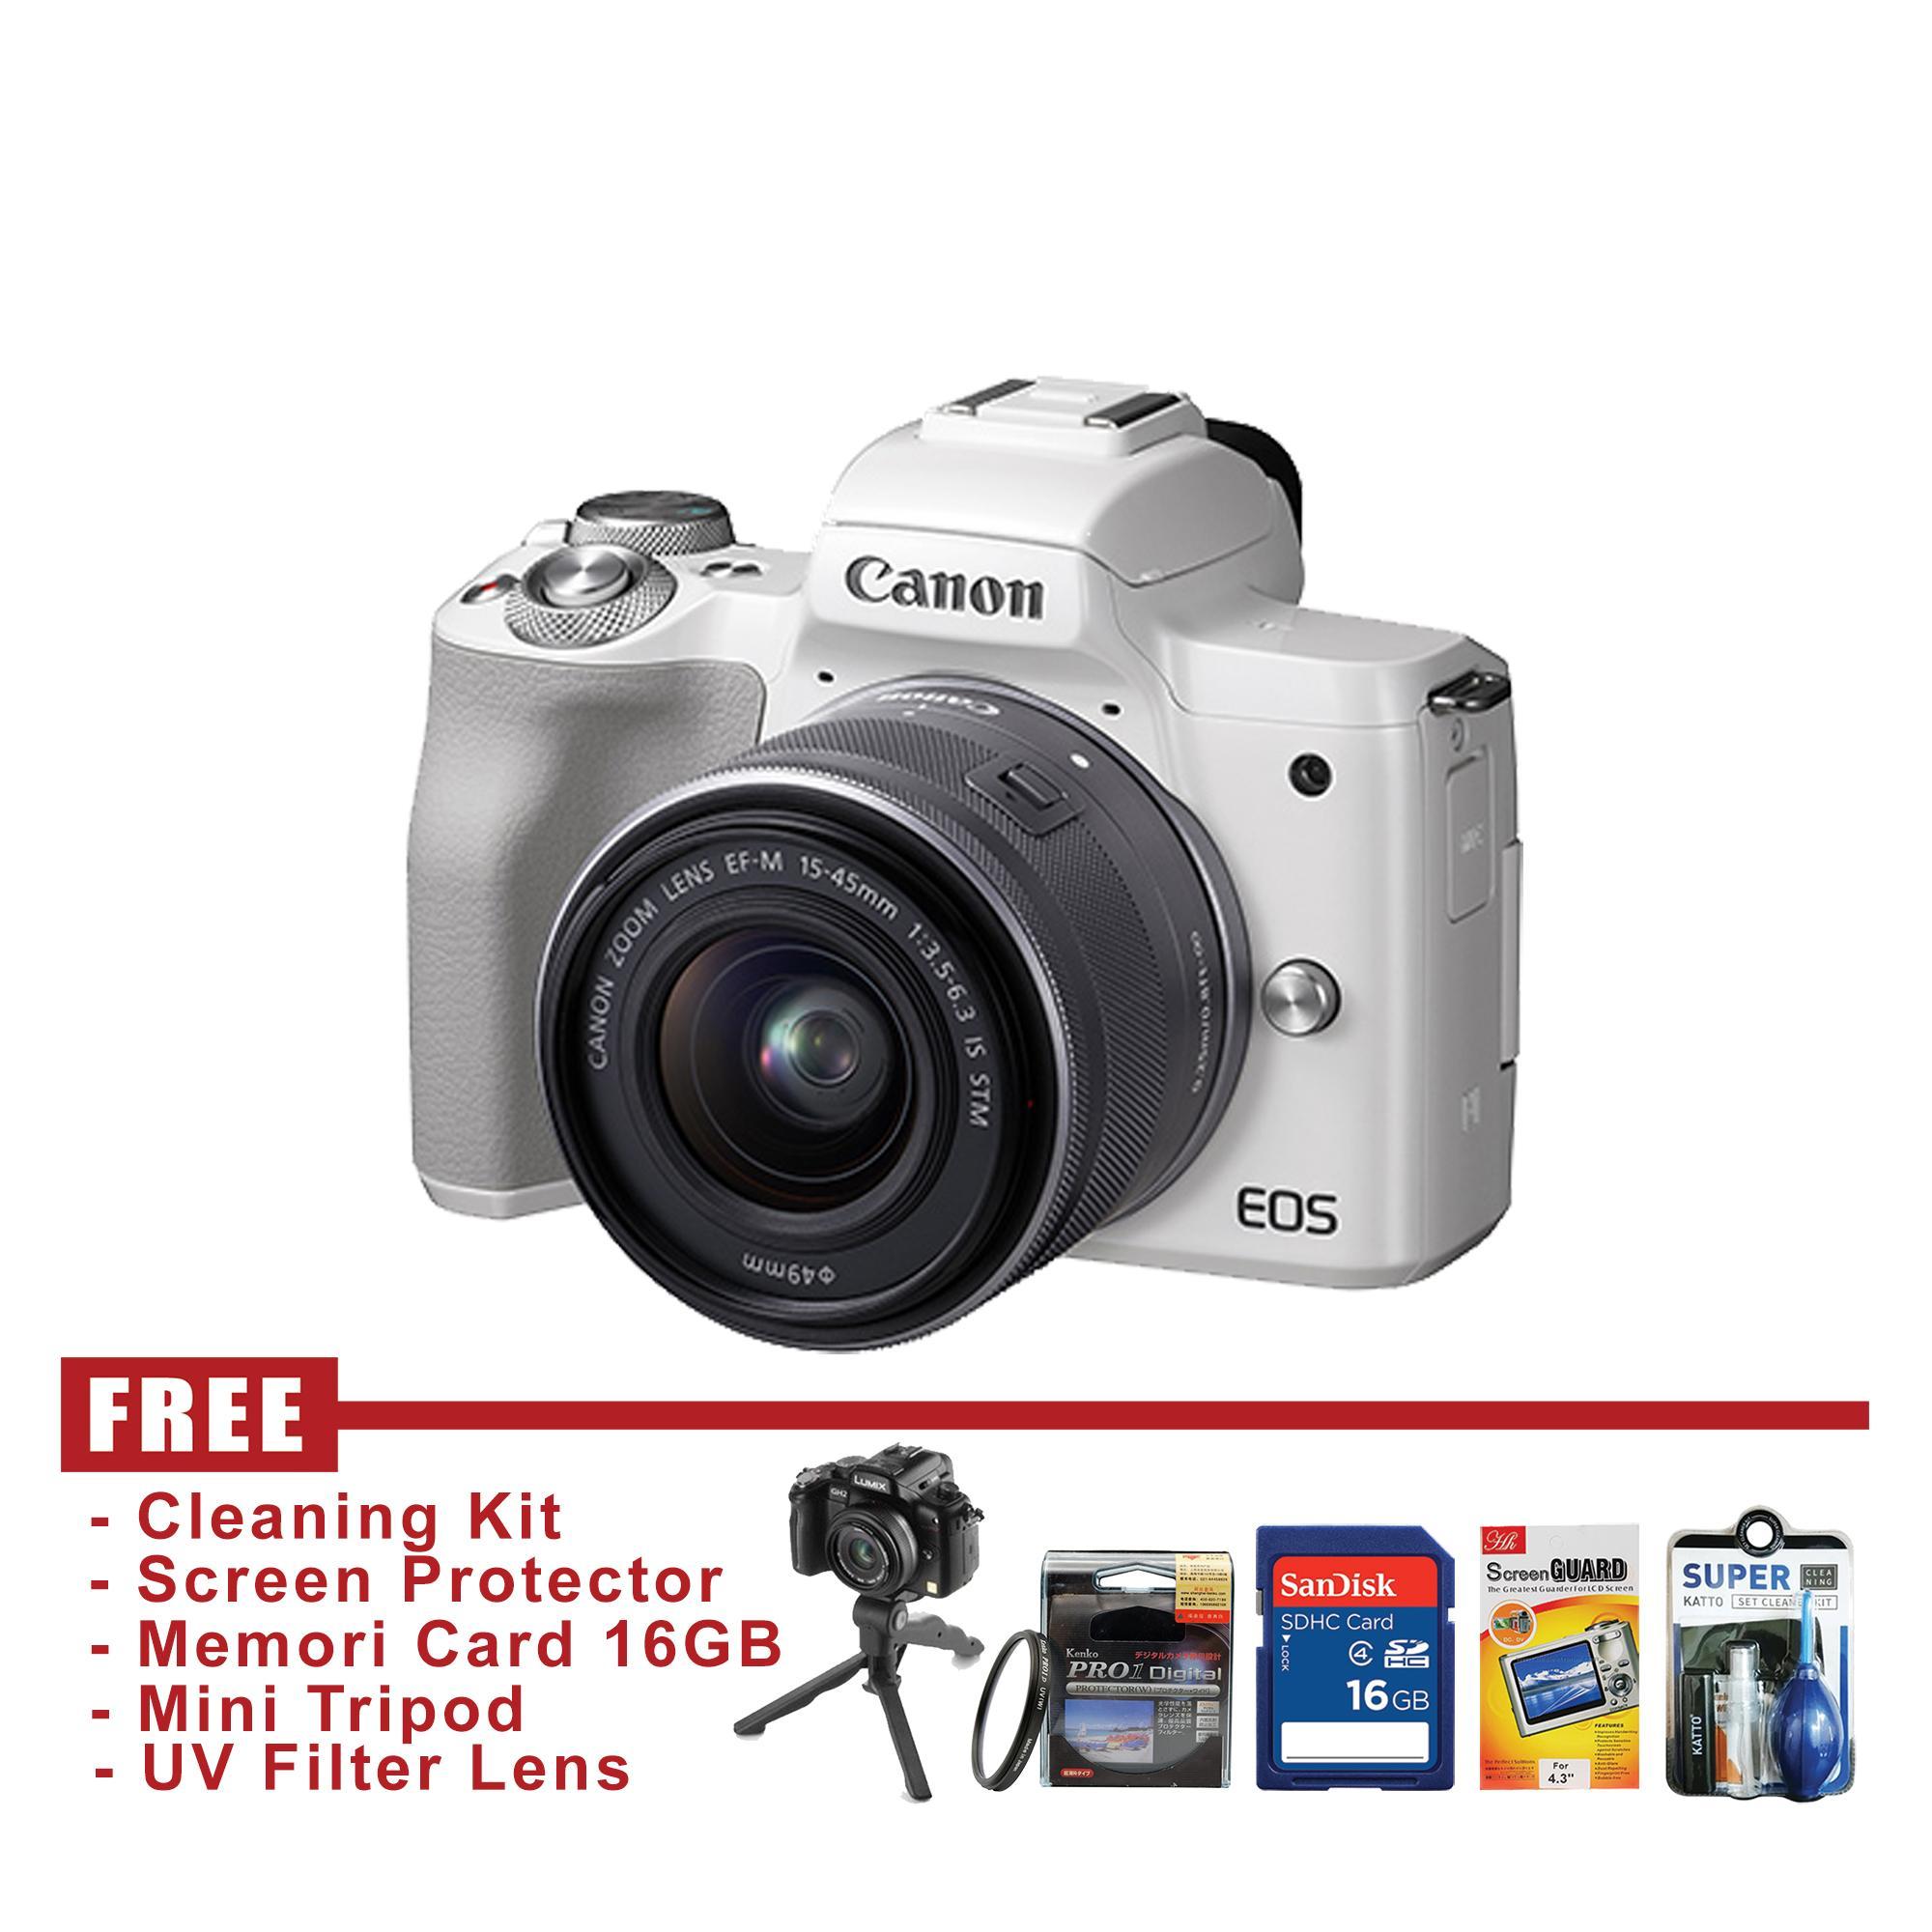 Canon EOS M50 Kit 15-45mm - Putih - FREE Accessories